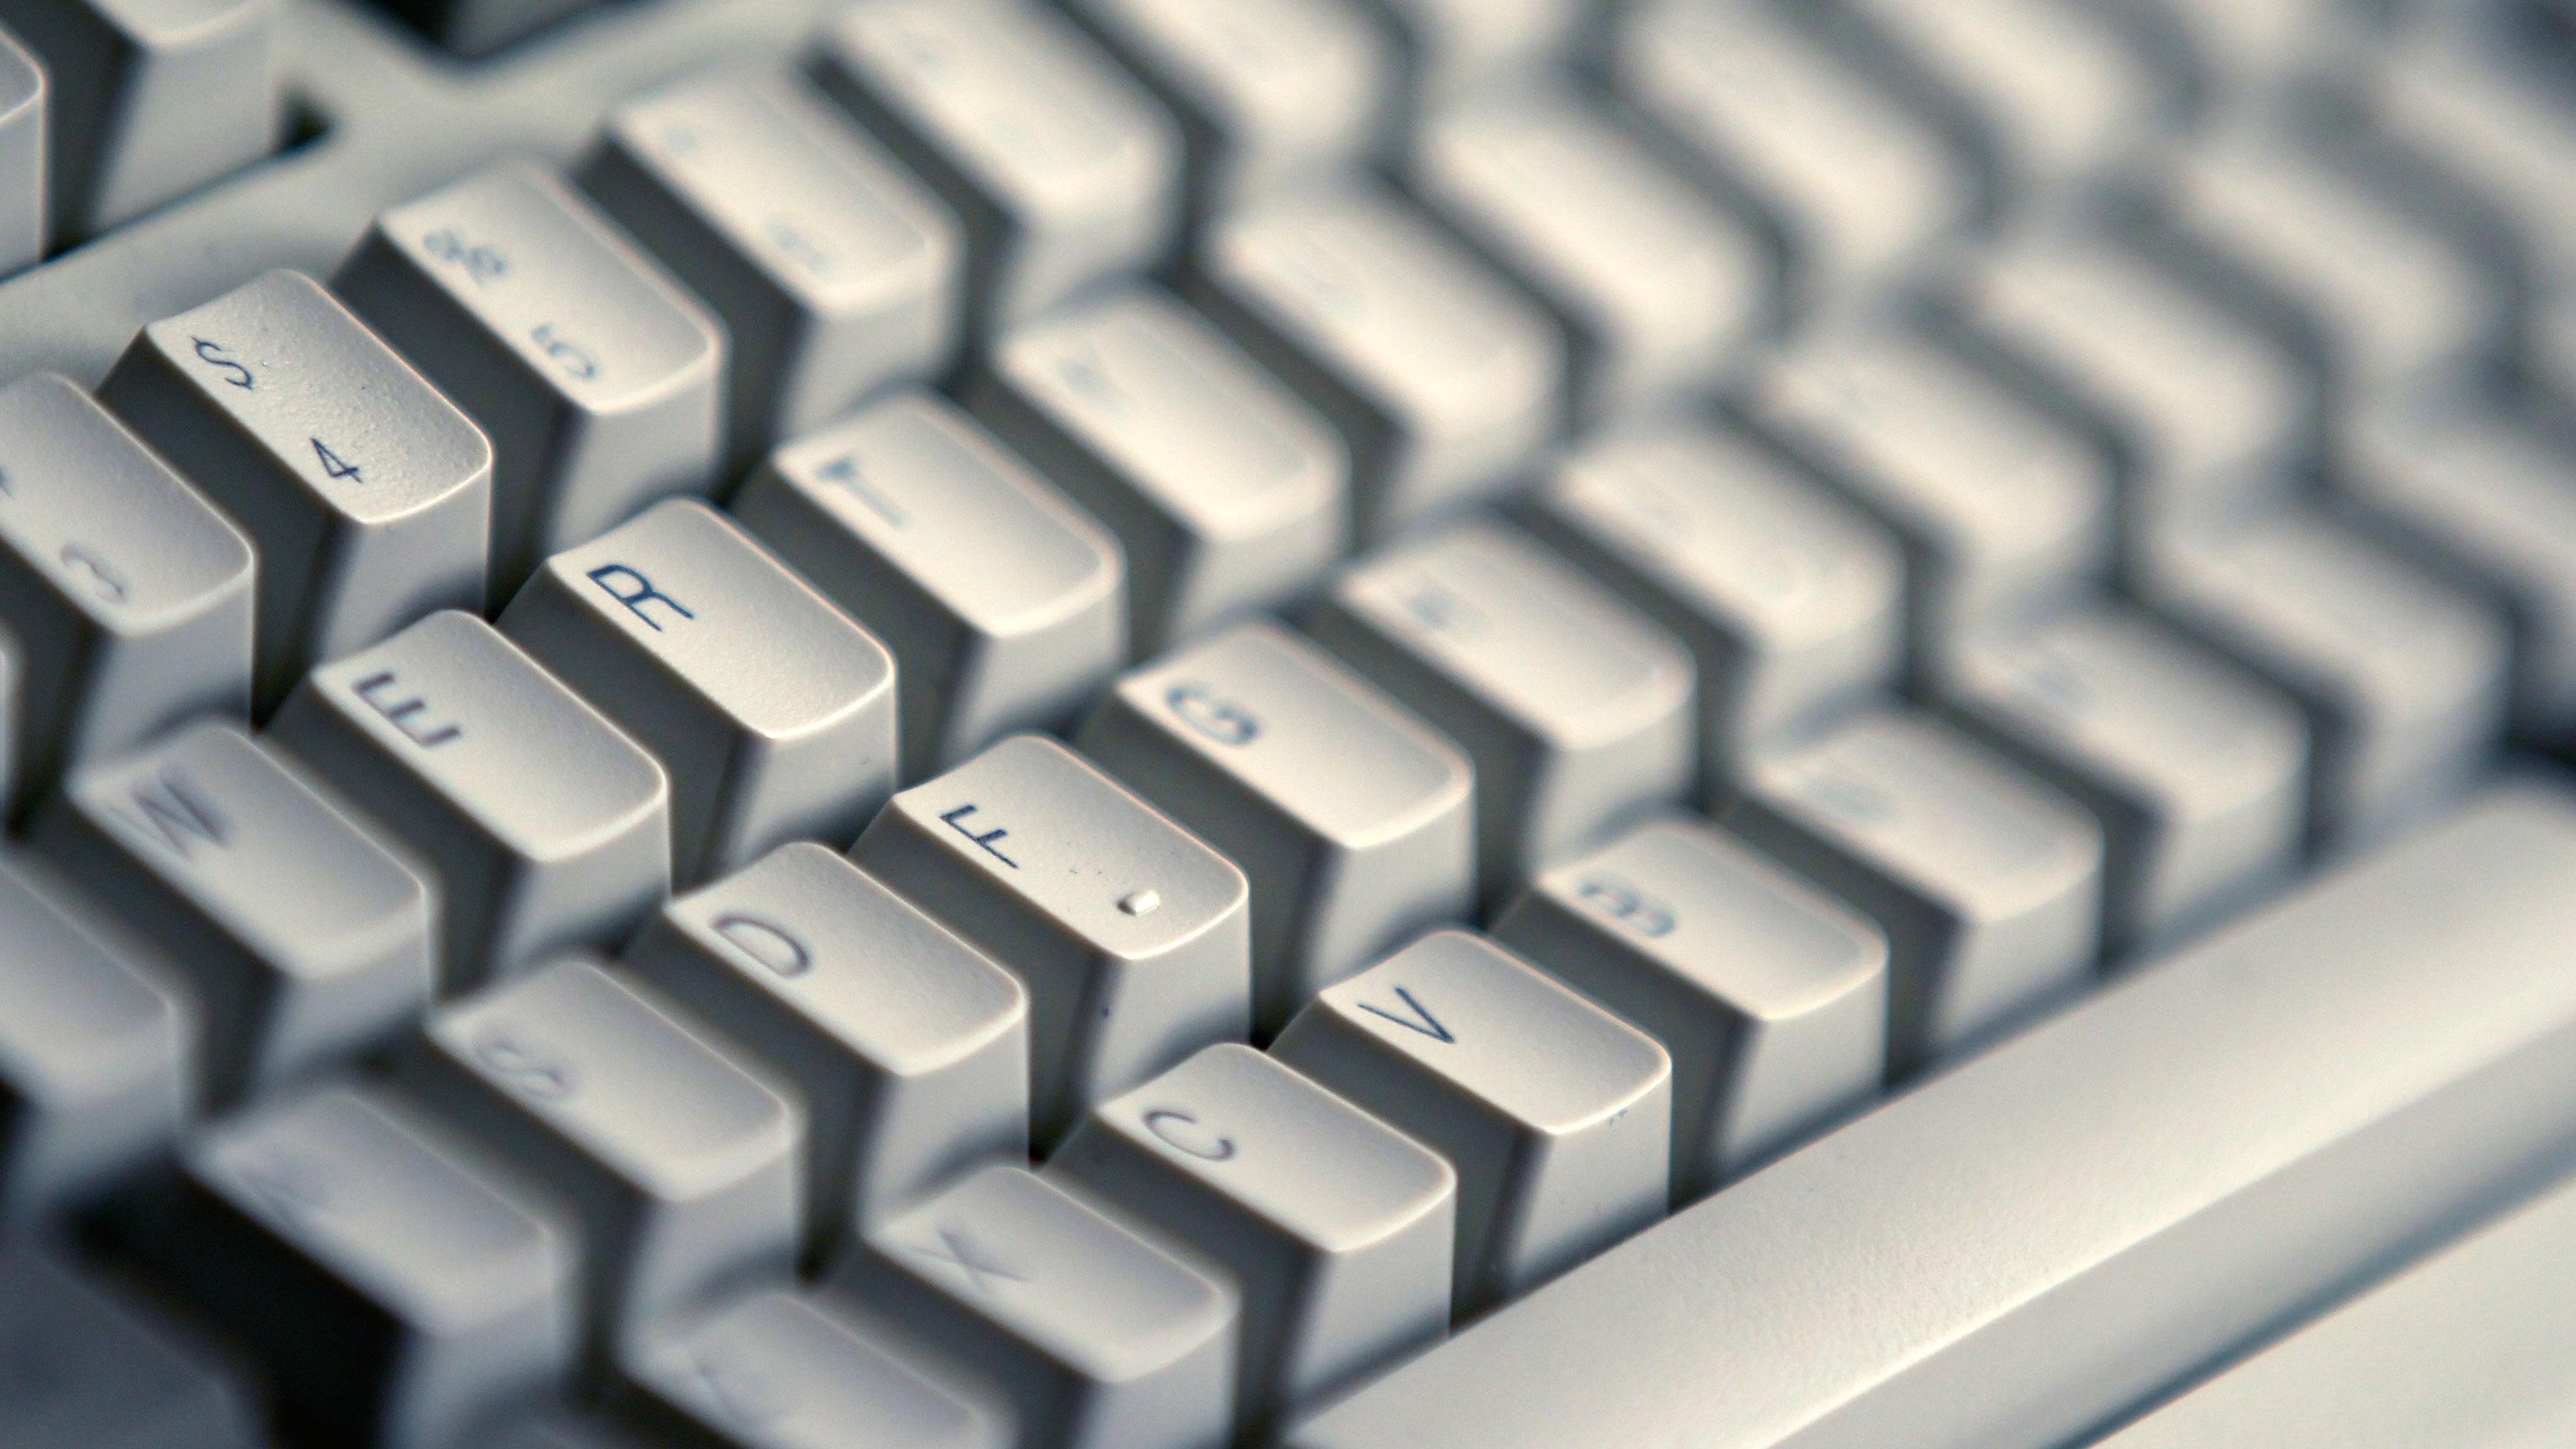 A computer keyboard is seen in Bucharest April 3, 2012. REUTERS/Bogdan Cristel (ROMANIA - Tags: BUSINESS)